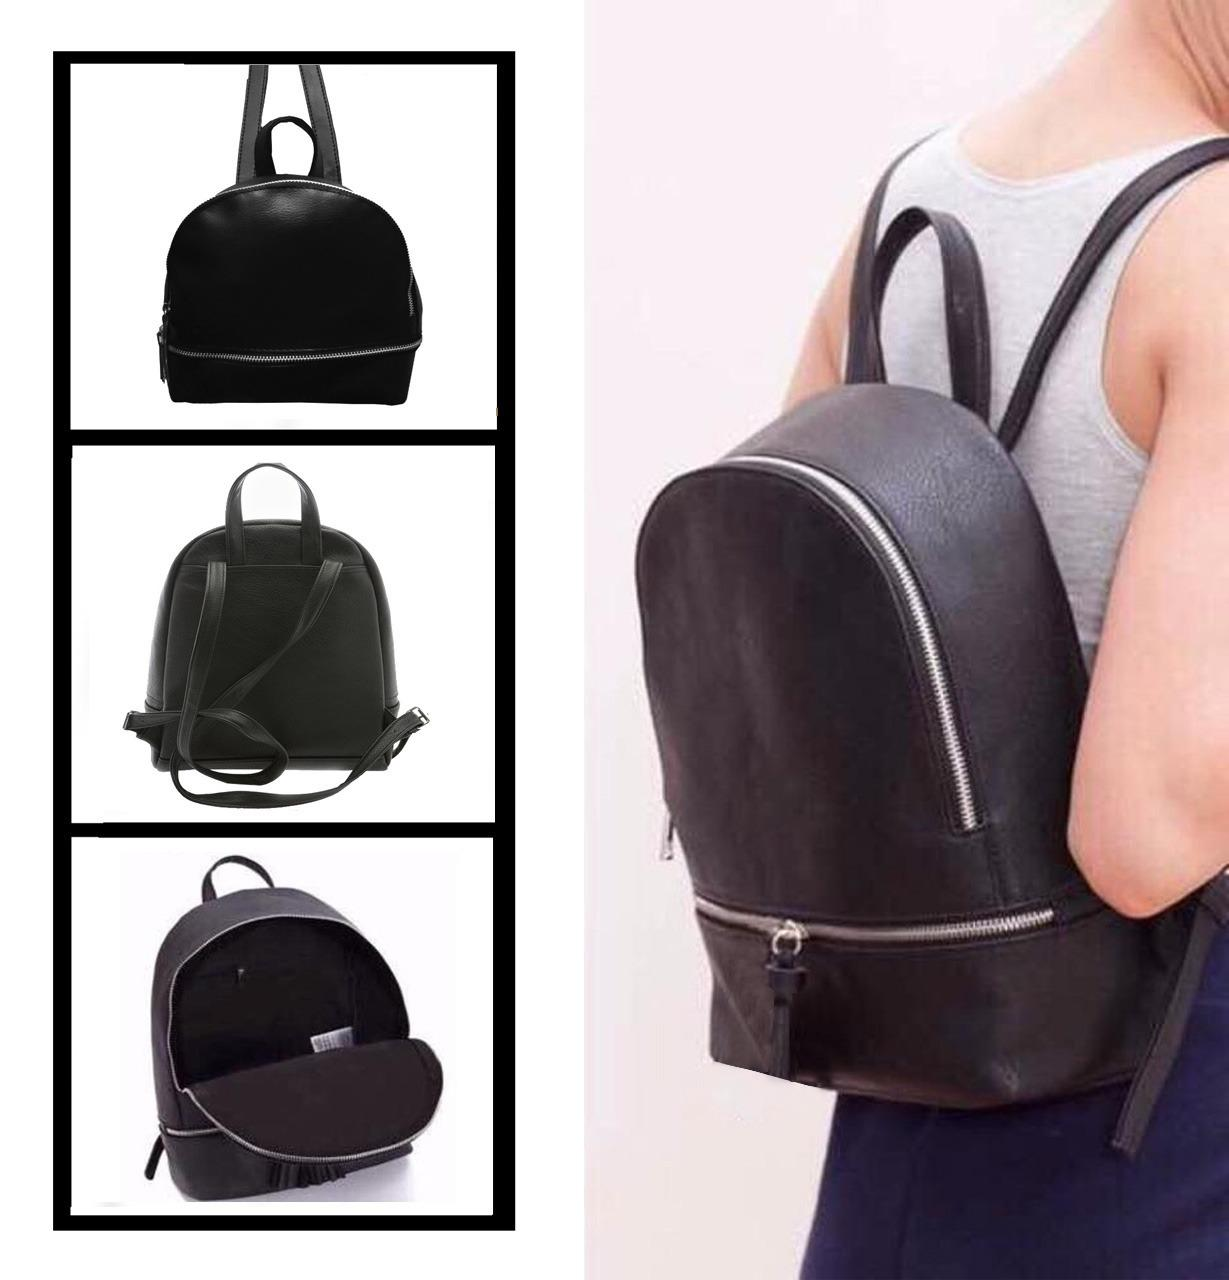 Tas Ransel Wanita / Korean Fashion Style / Babosarang / Tas Ransel Wanita / Backpack Korea